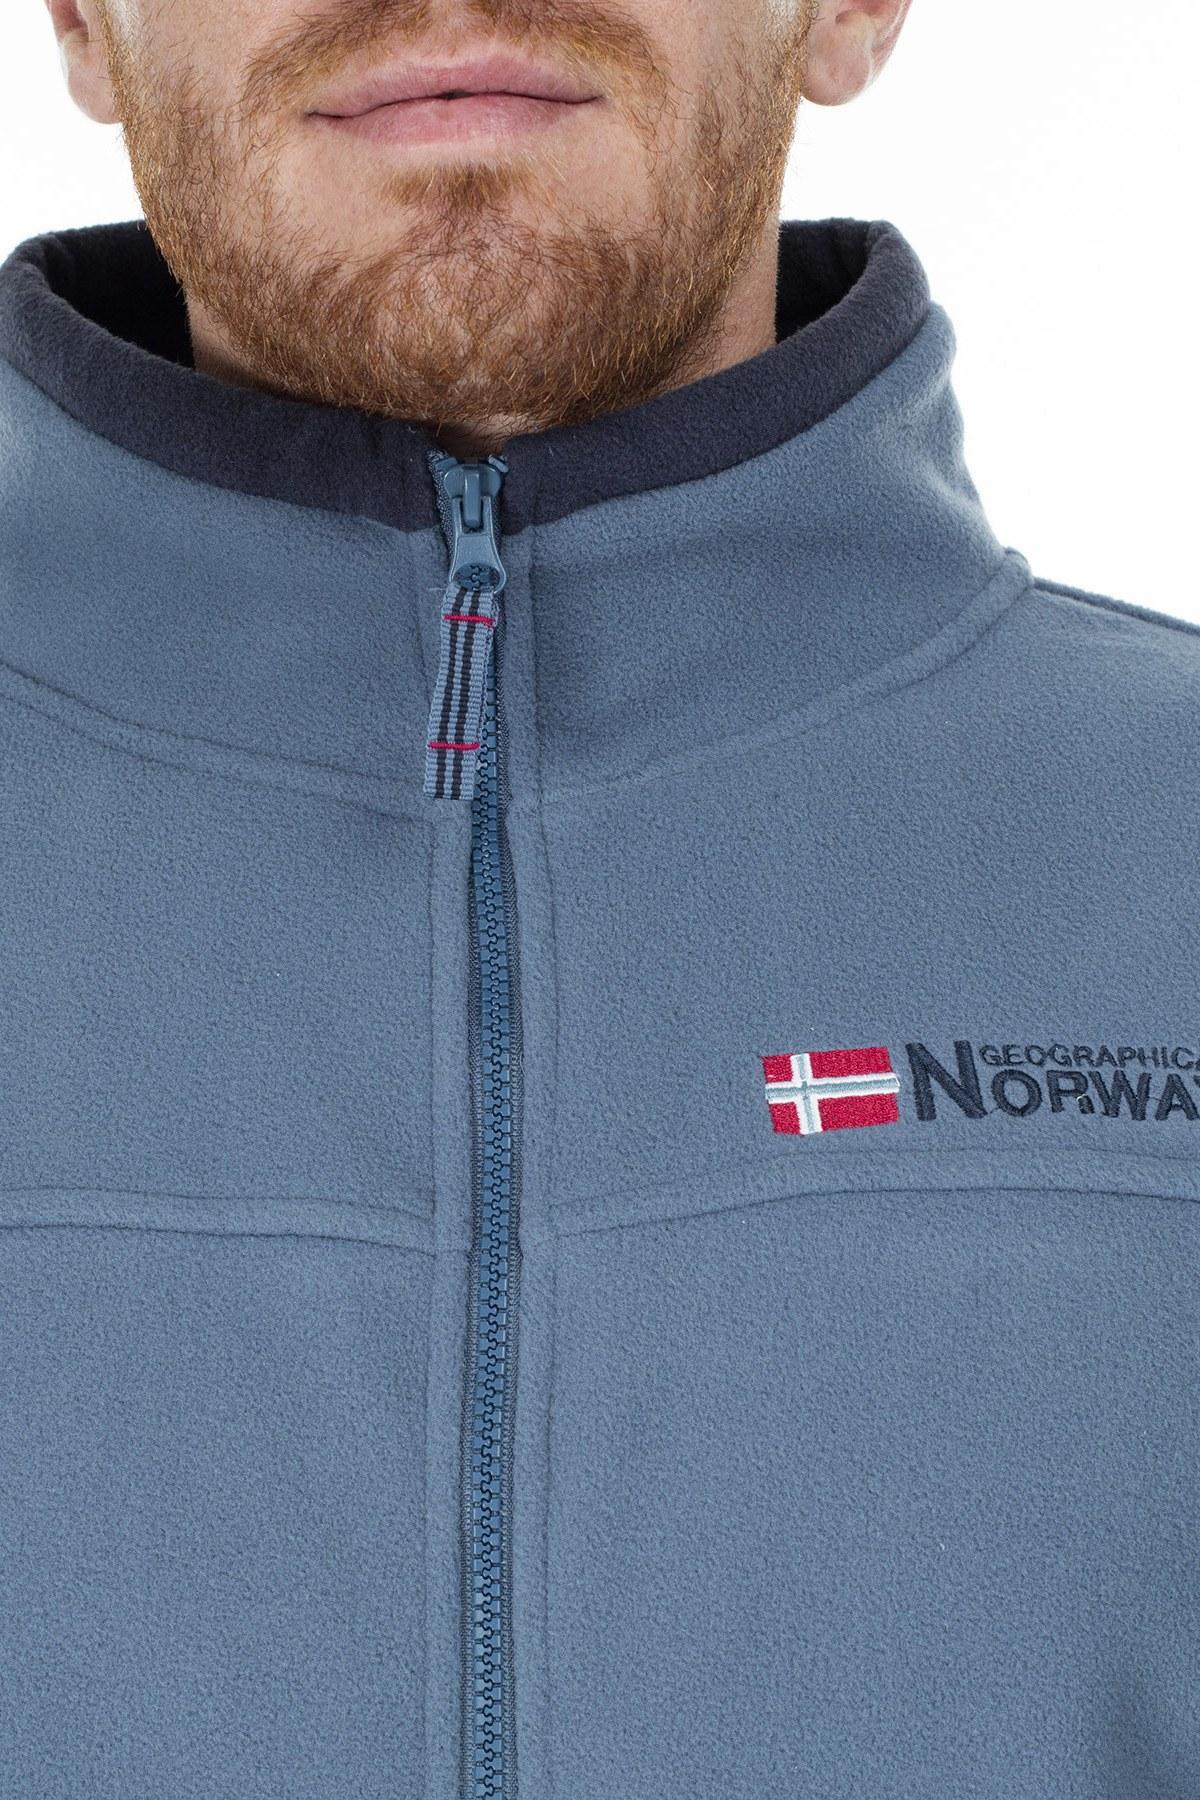 Norway Geographical Outdoor Erkek Polar TAMAZONIE PETROL-LACİVERT